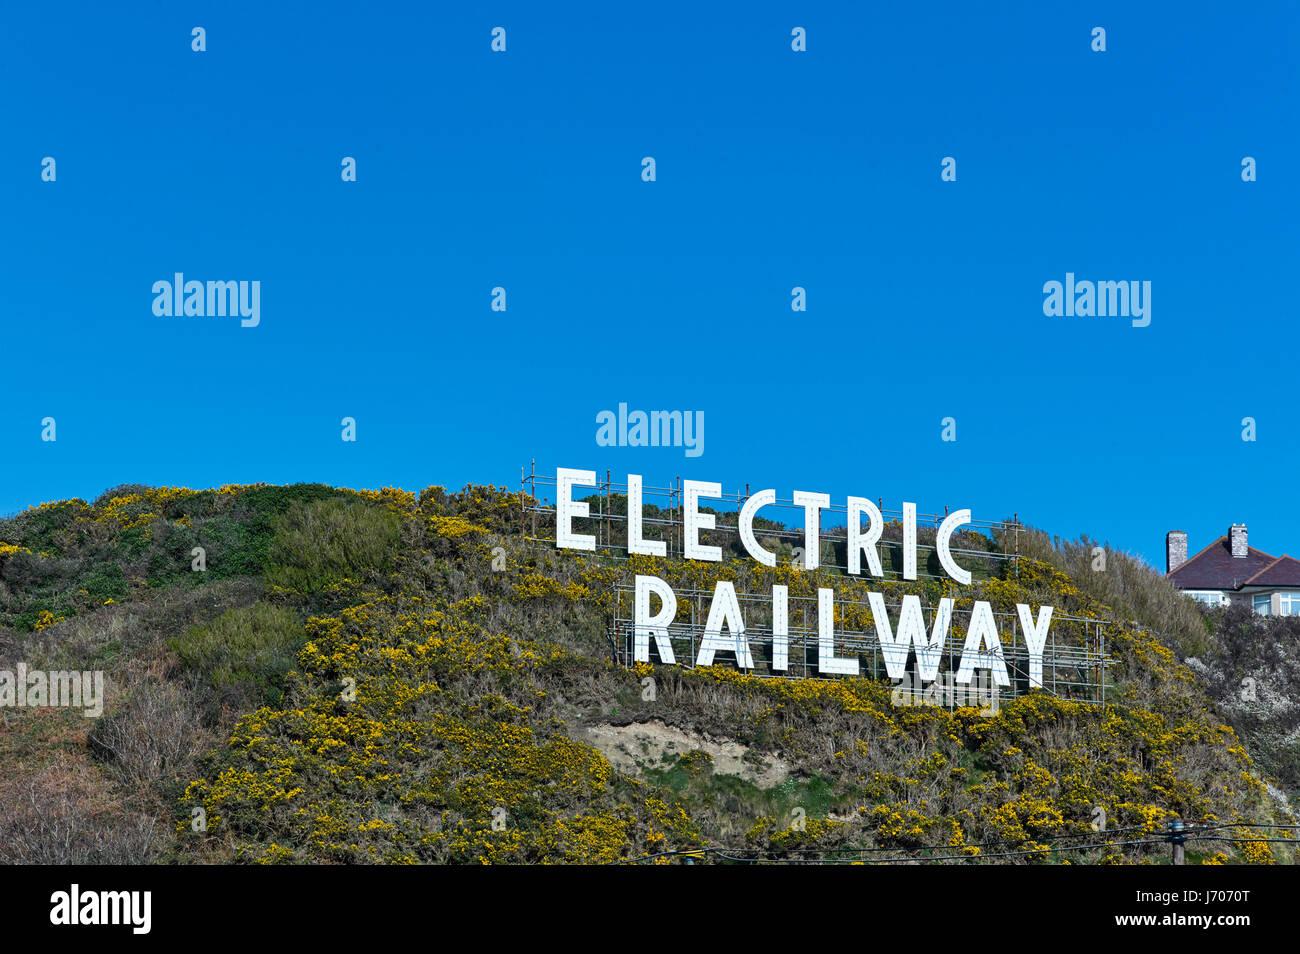 Electric railway sign in Douglas, Isle of Man Stock Photo